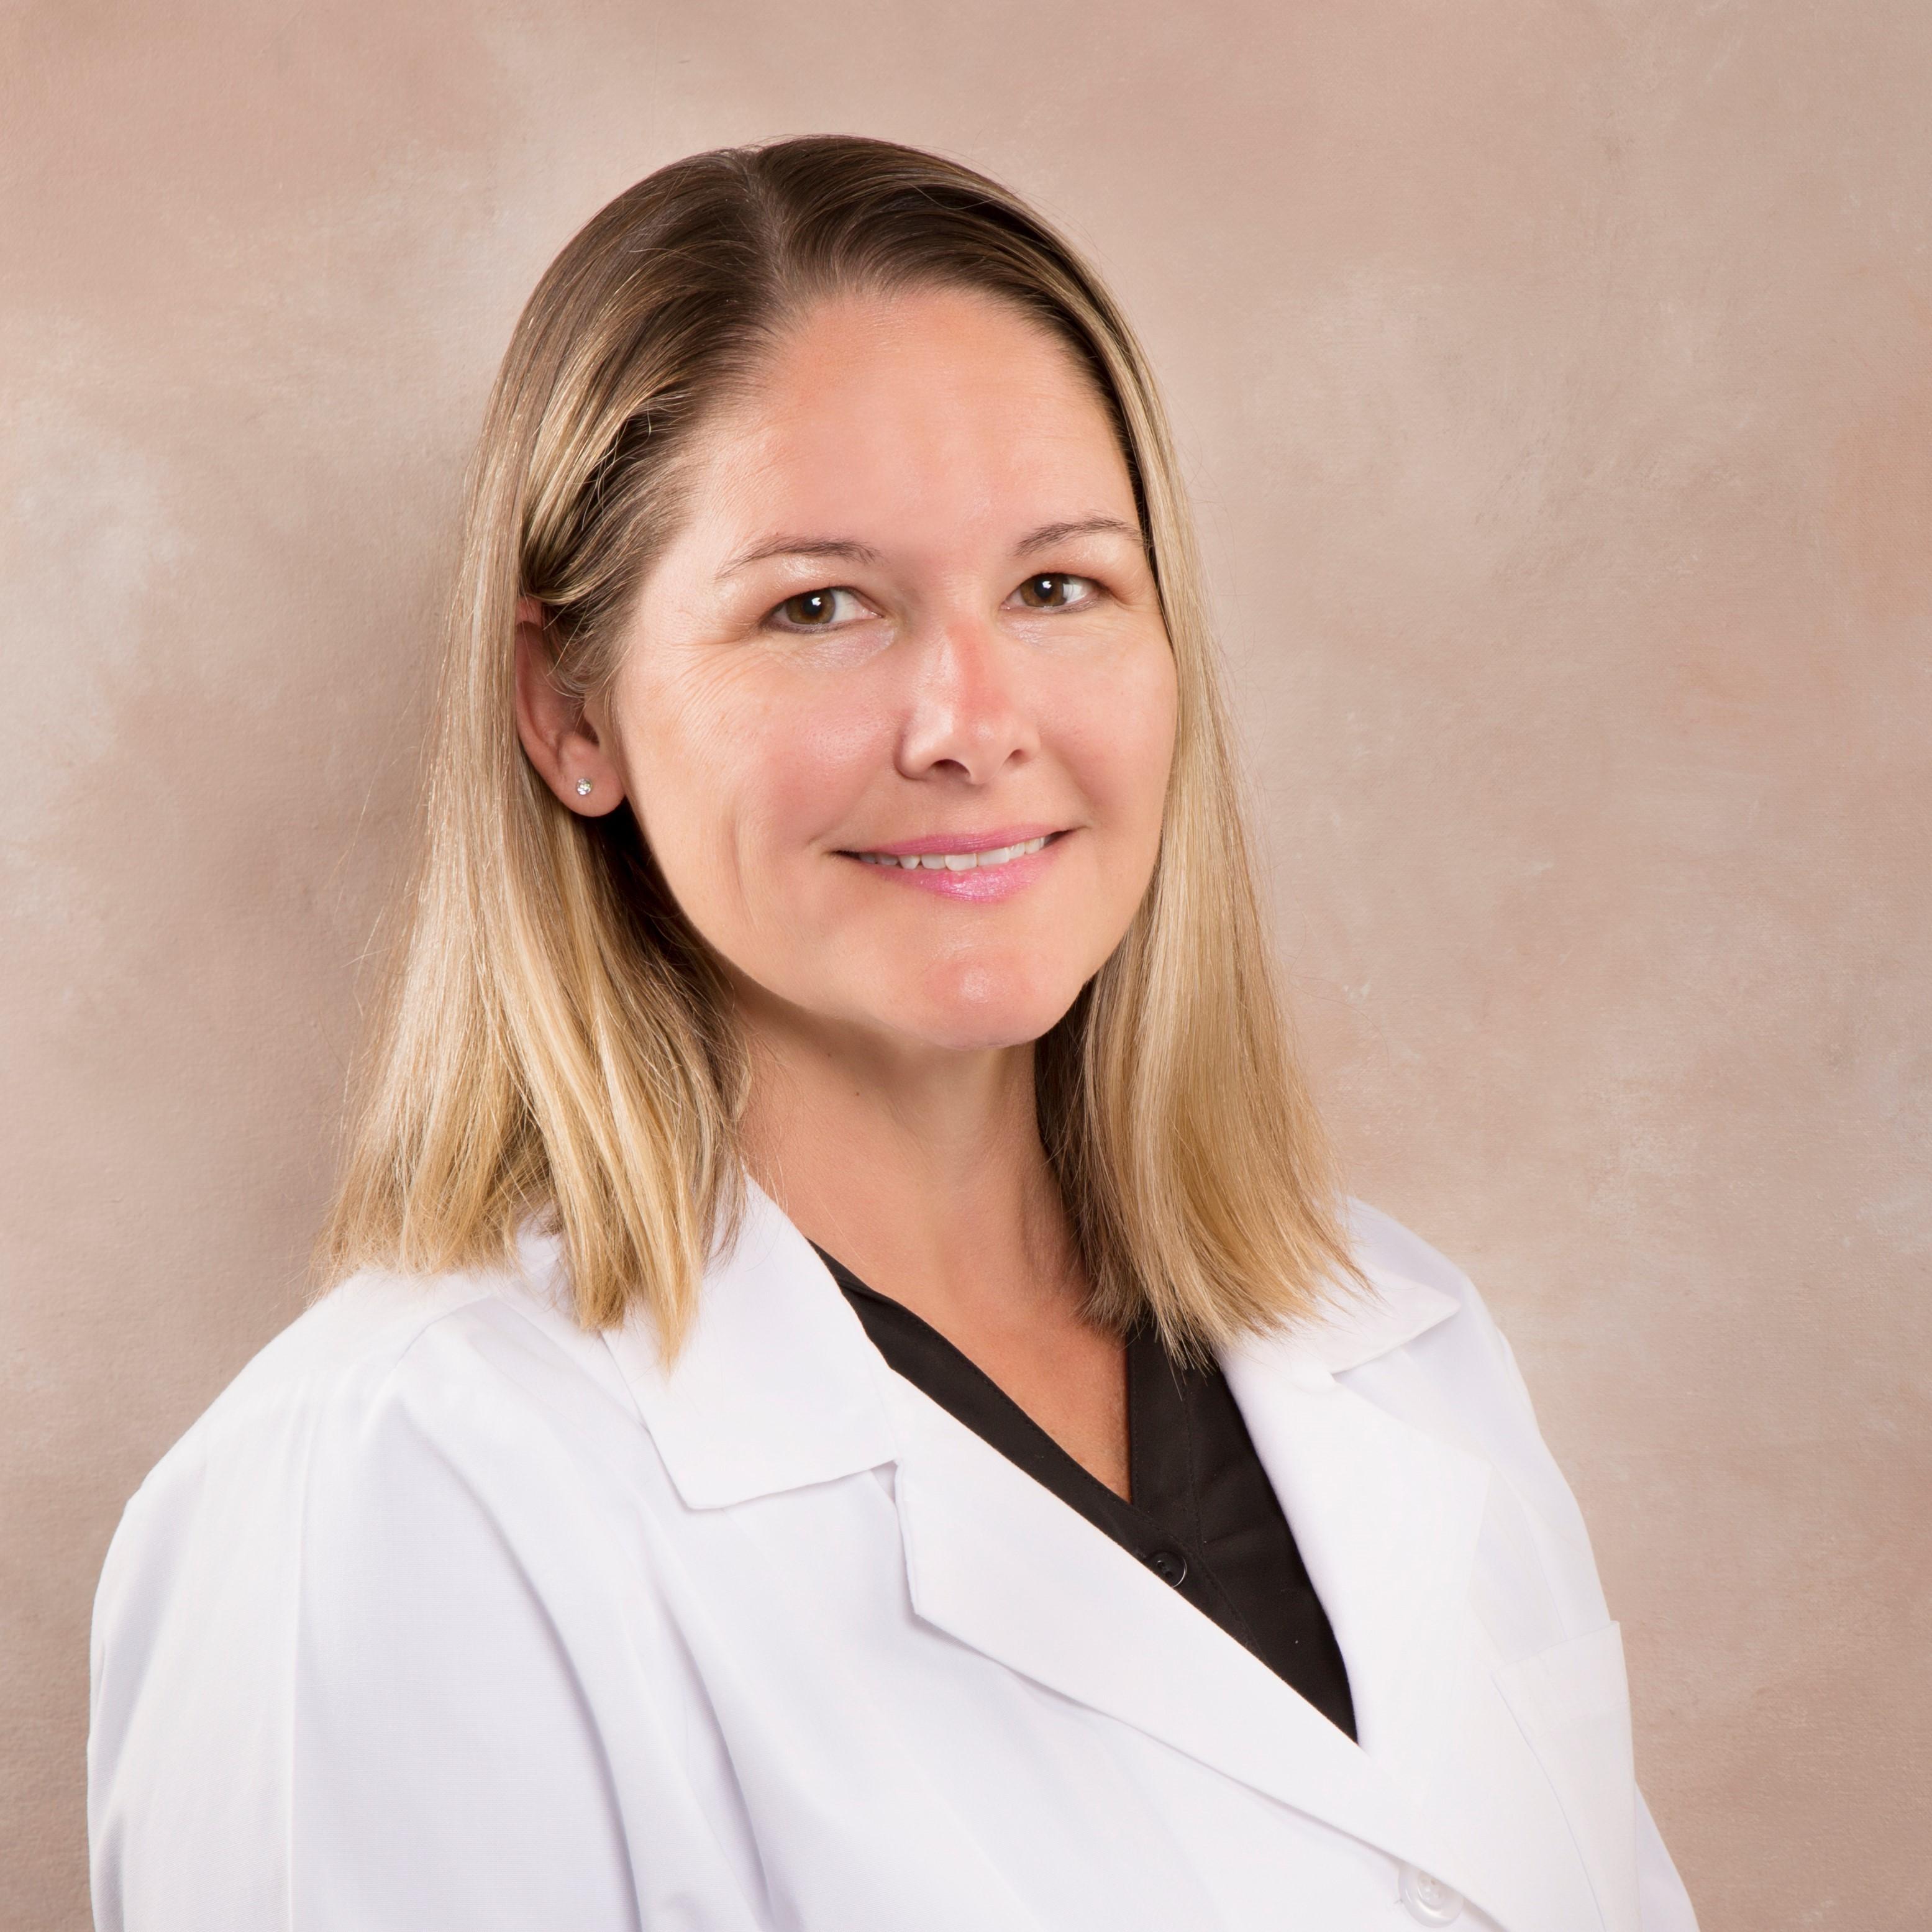 Margaret Desear Msn Aprn Fnp C Millennium Physician Group